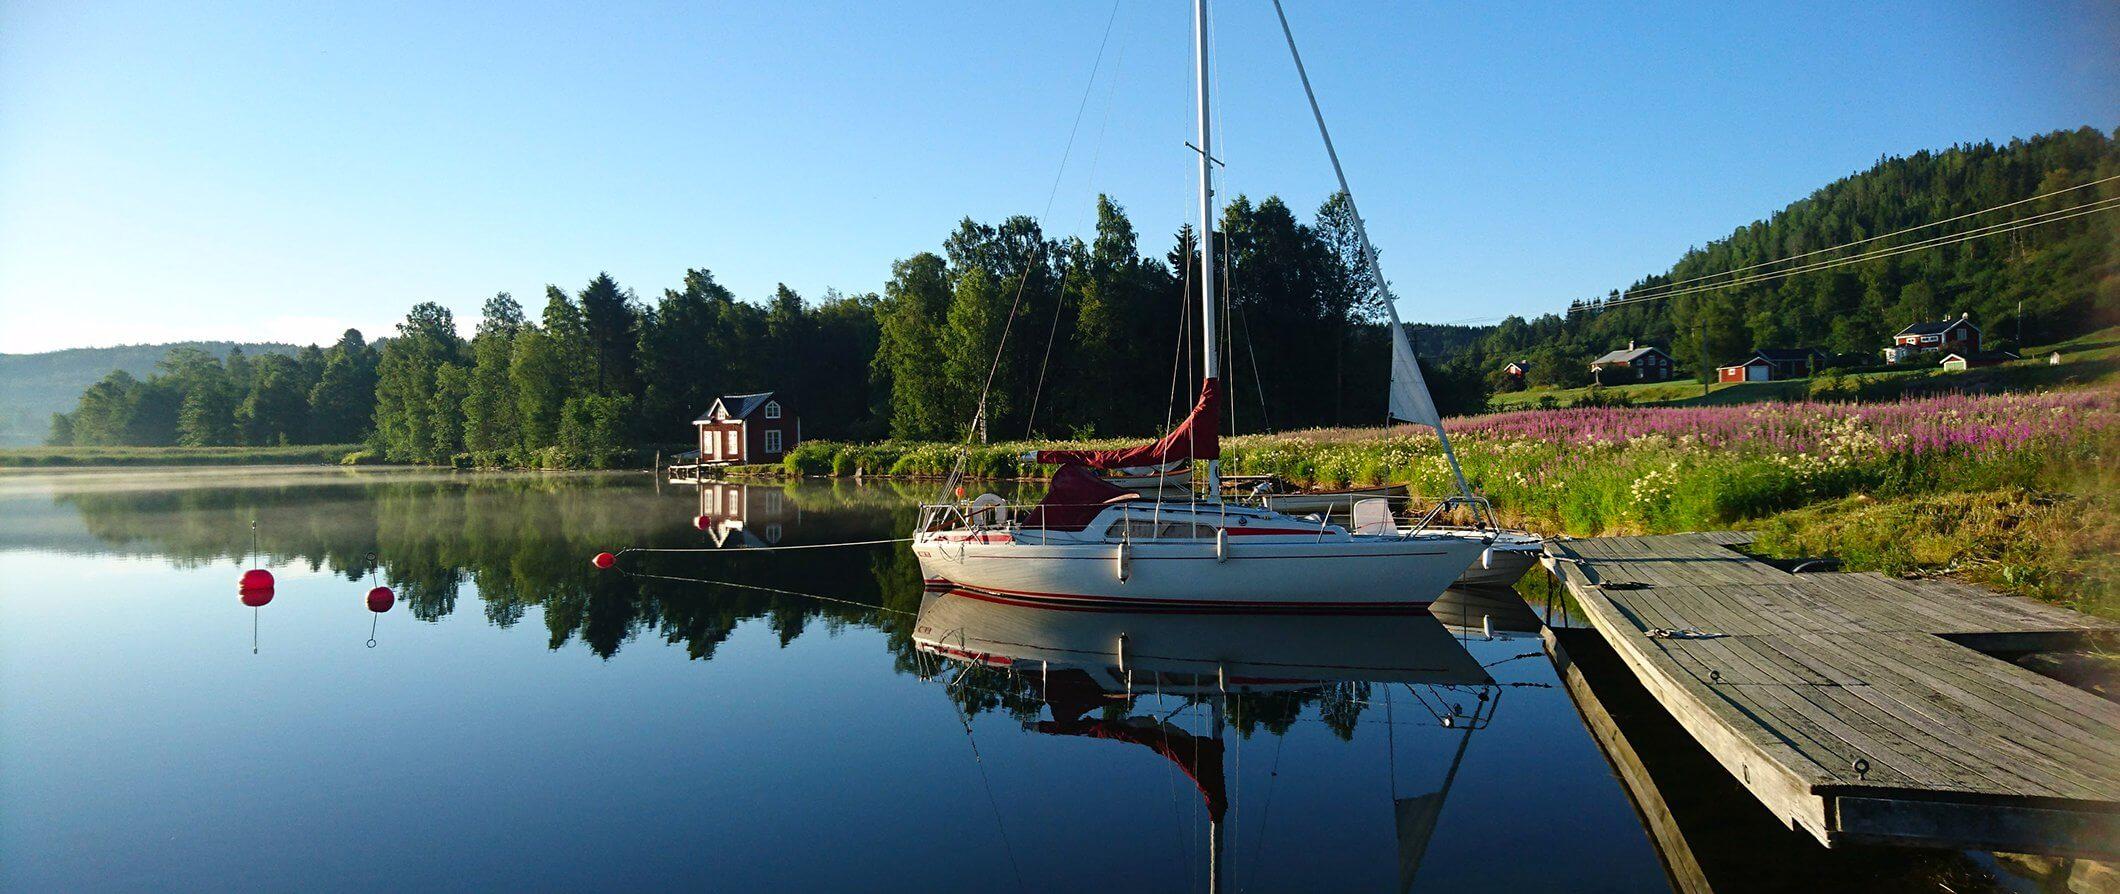 Cheap Insurance Companies >> Sweden Travel Guide